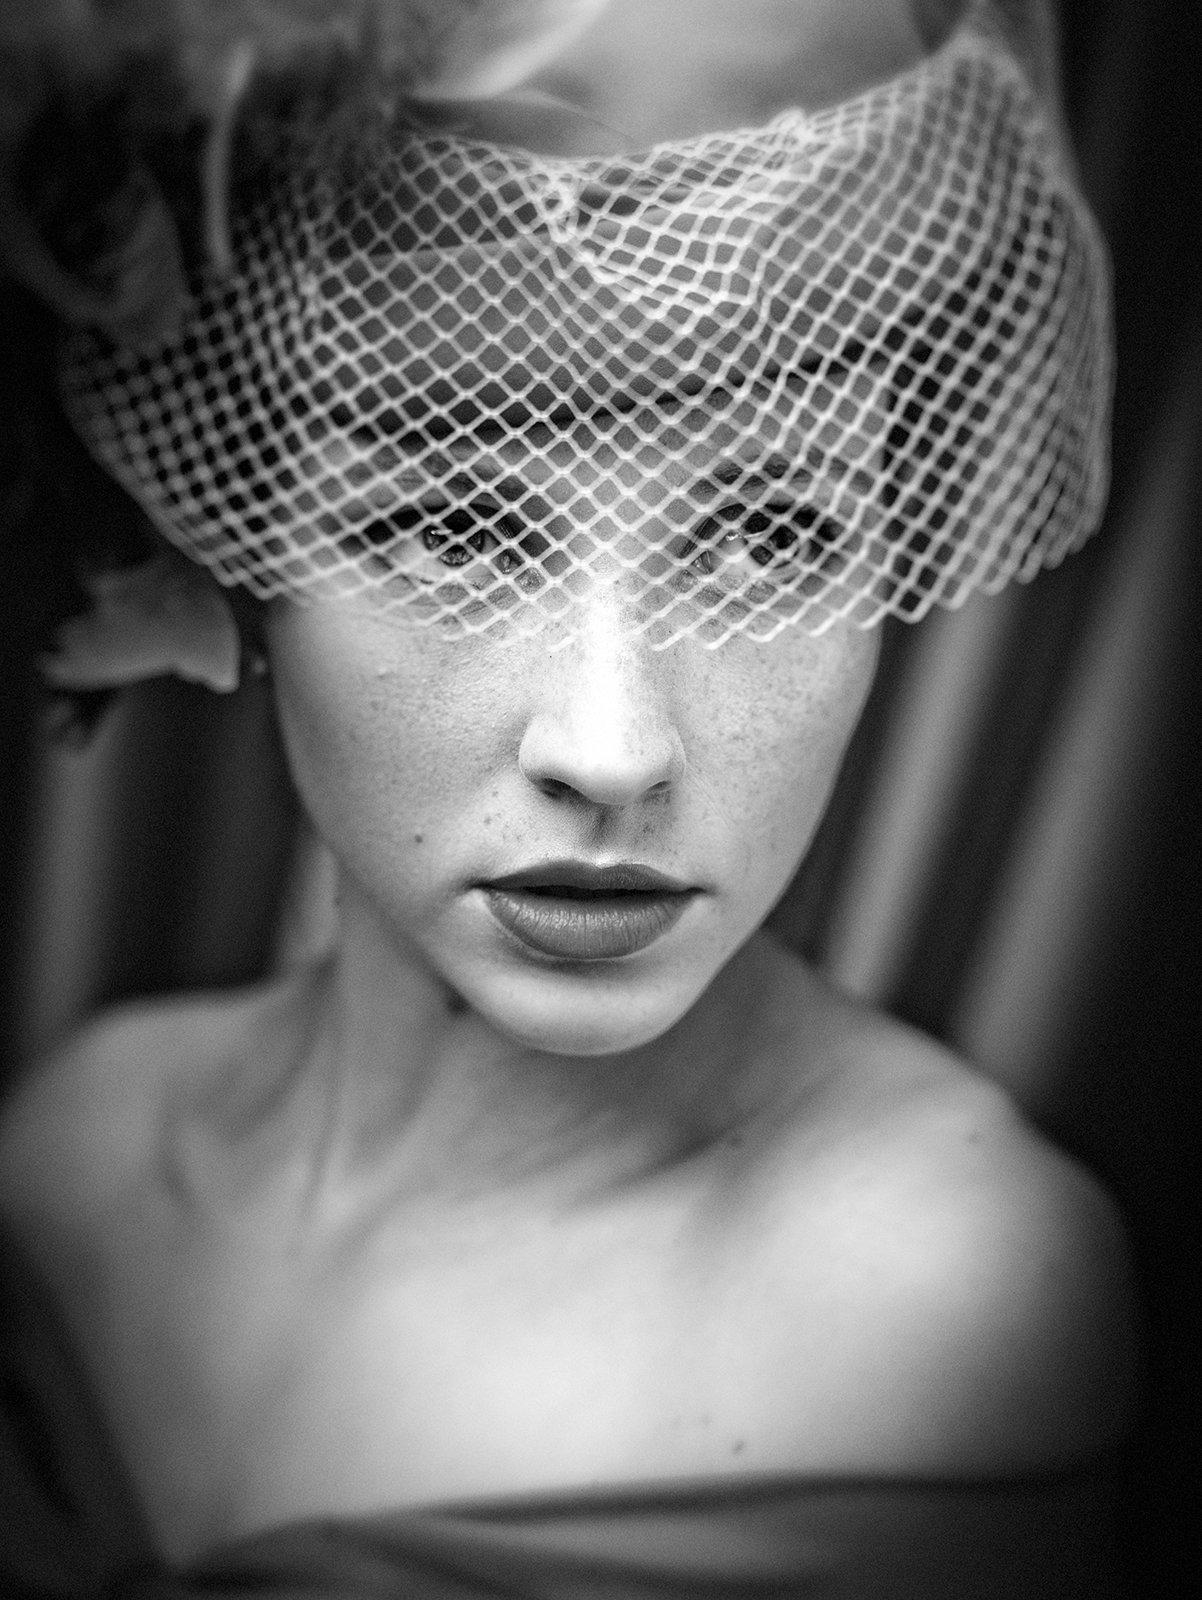 woman, female, portrait, retro, retro styled, style, stylish, look, face, mood, sensual, tenderness, Дмитрий Толоконов